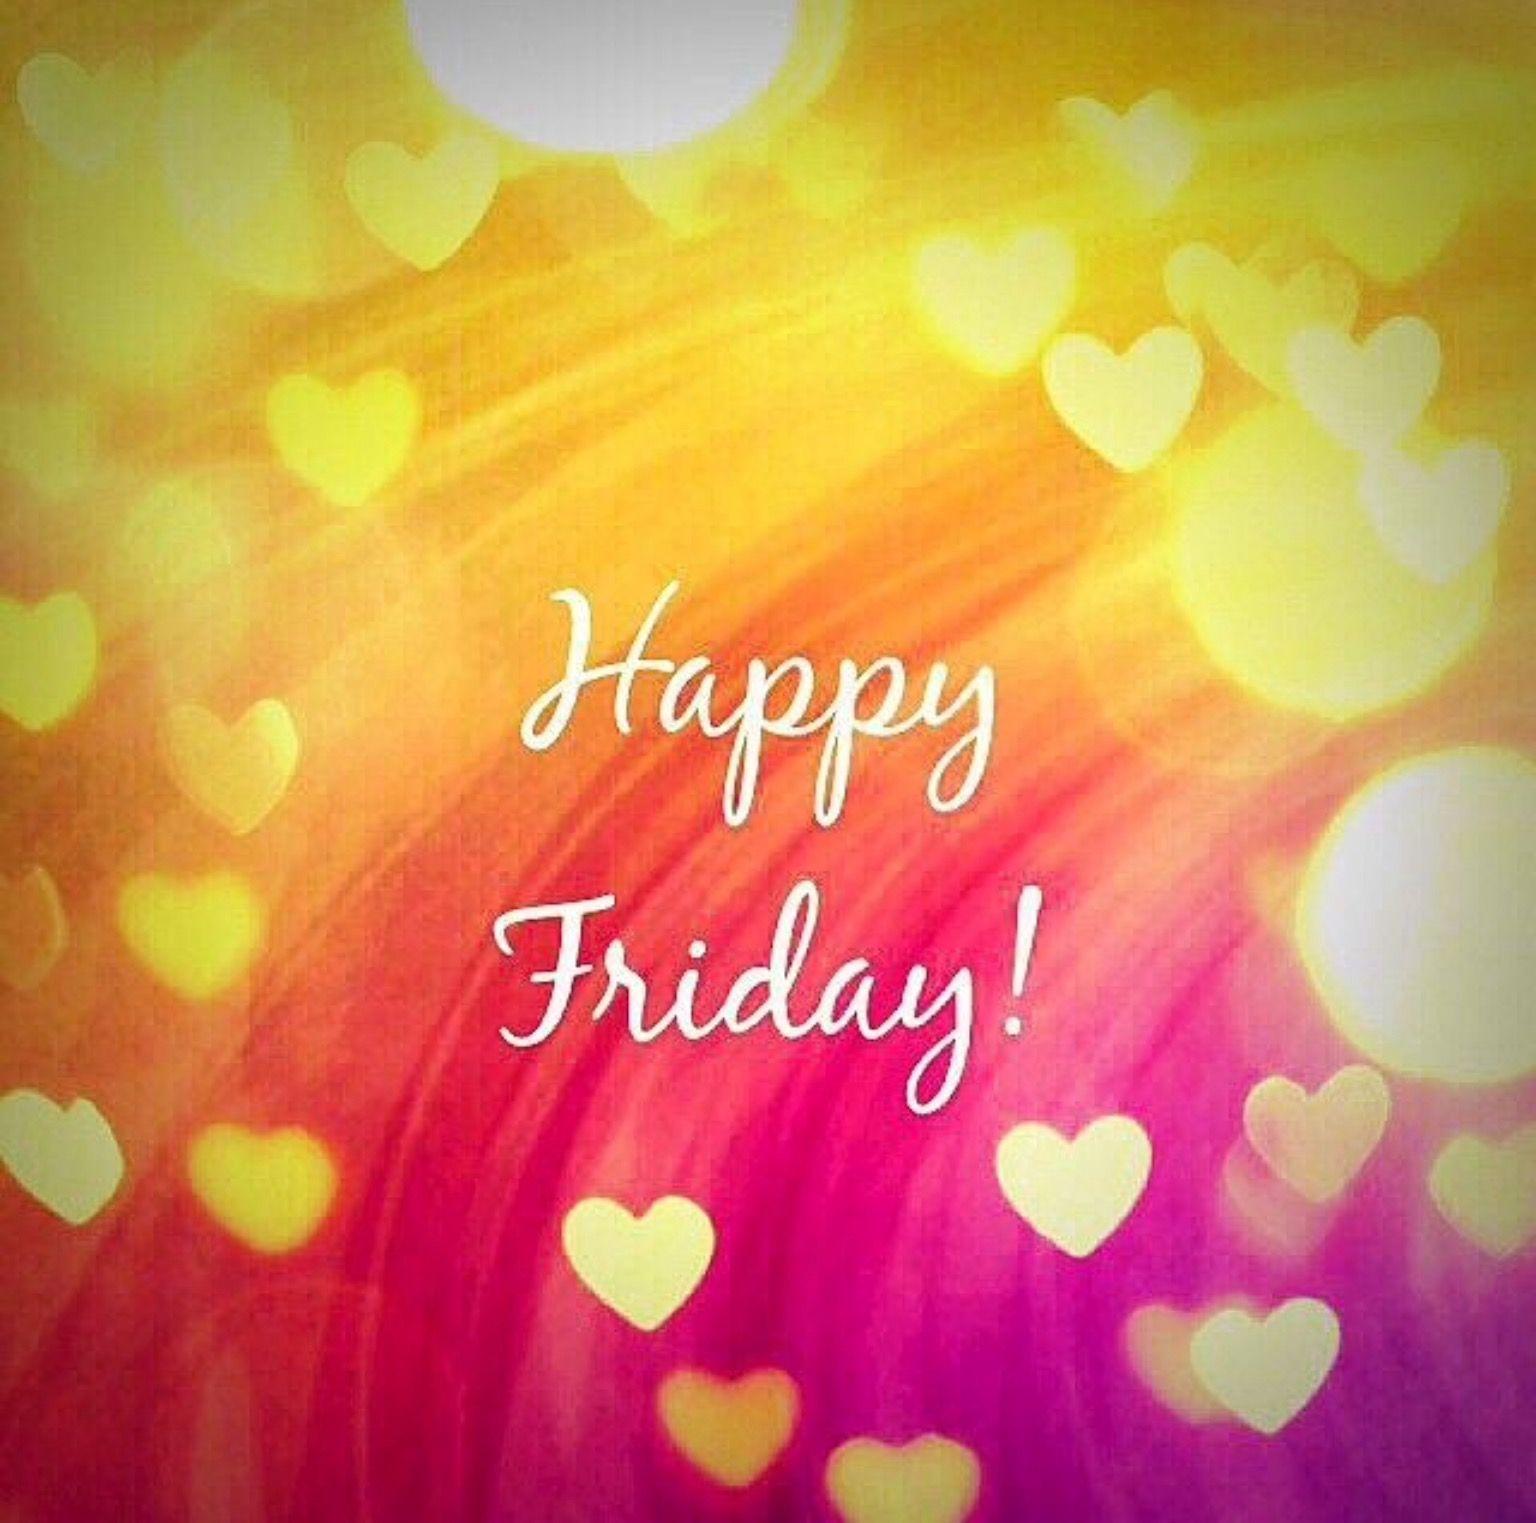 Good Morning Beautiful Happy Friday : Good morning my beautiful girls happy friday days